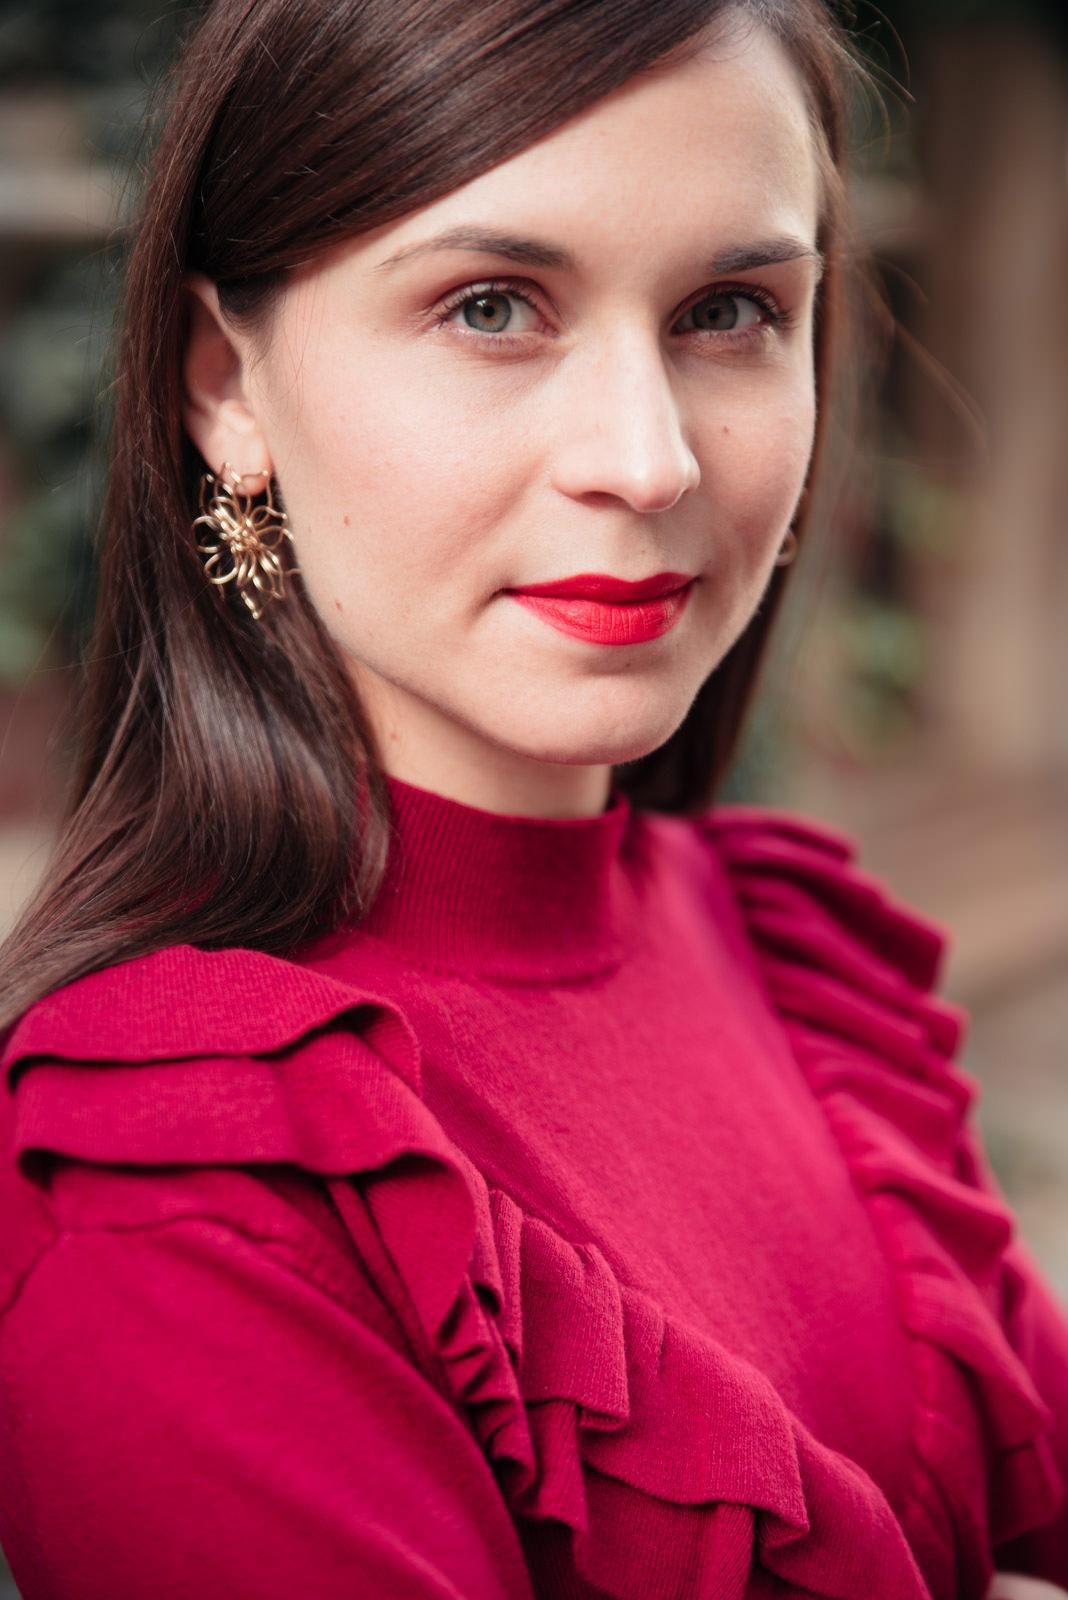 Blog-Mode-And-The-City-Beaute-Mes-3-rouges-a-levres-rouges-favoris